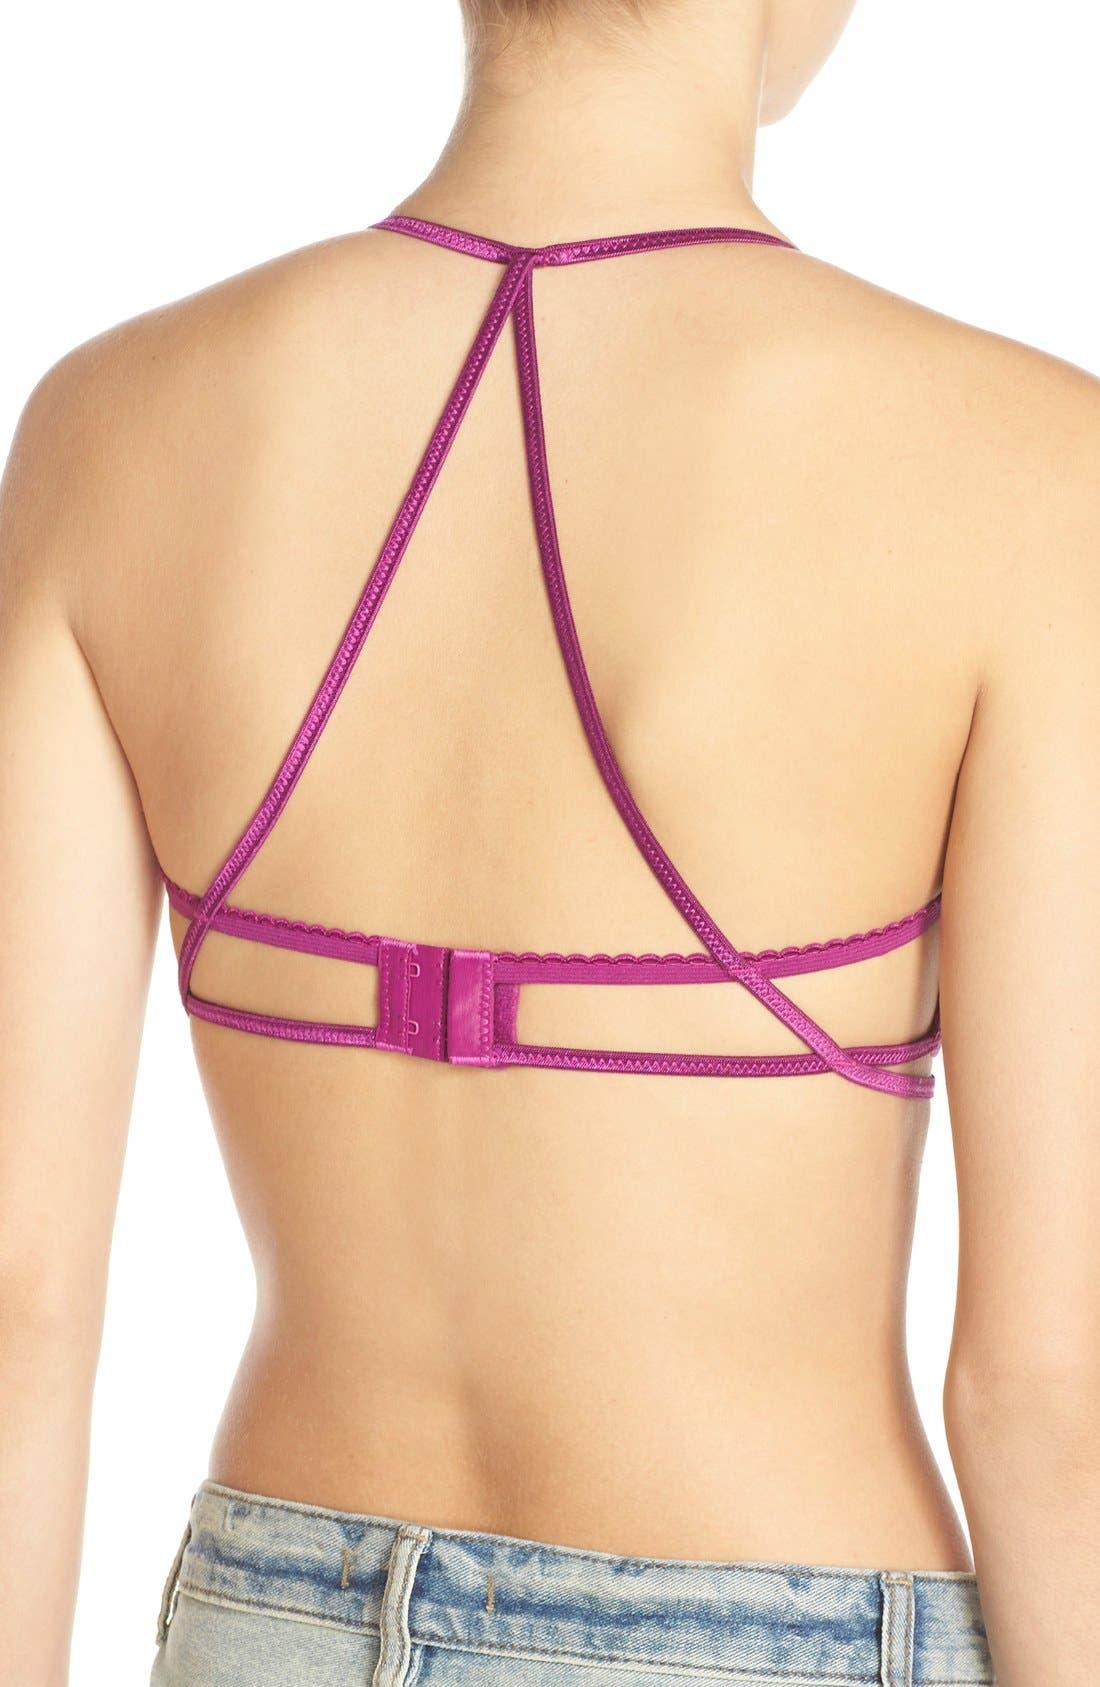 Alternate Image 2  - Free People 'Valentina' Cross Back Triangle Bralette